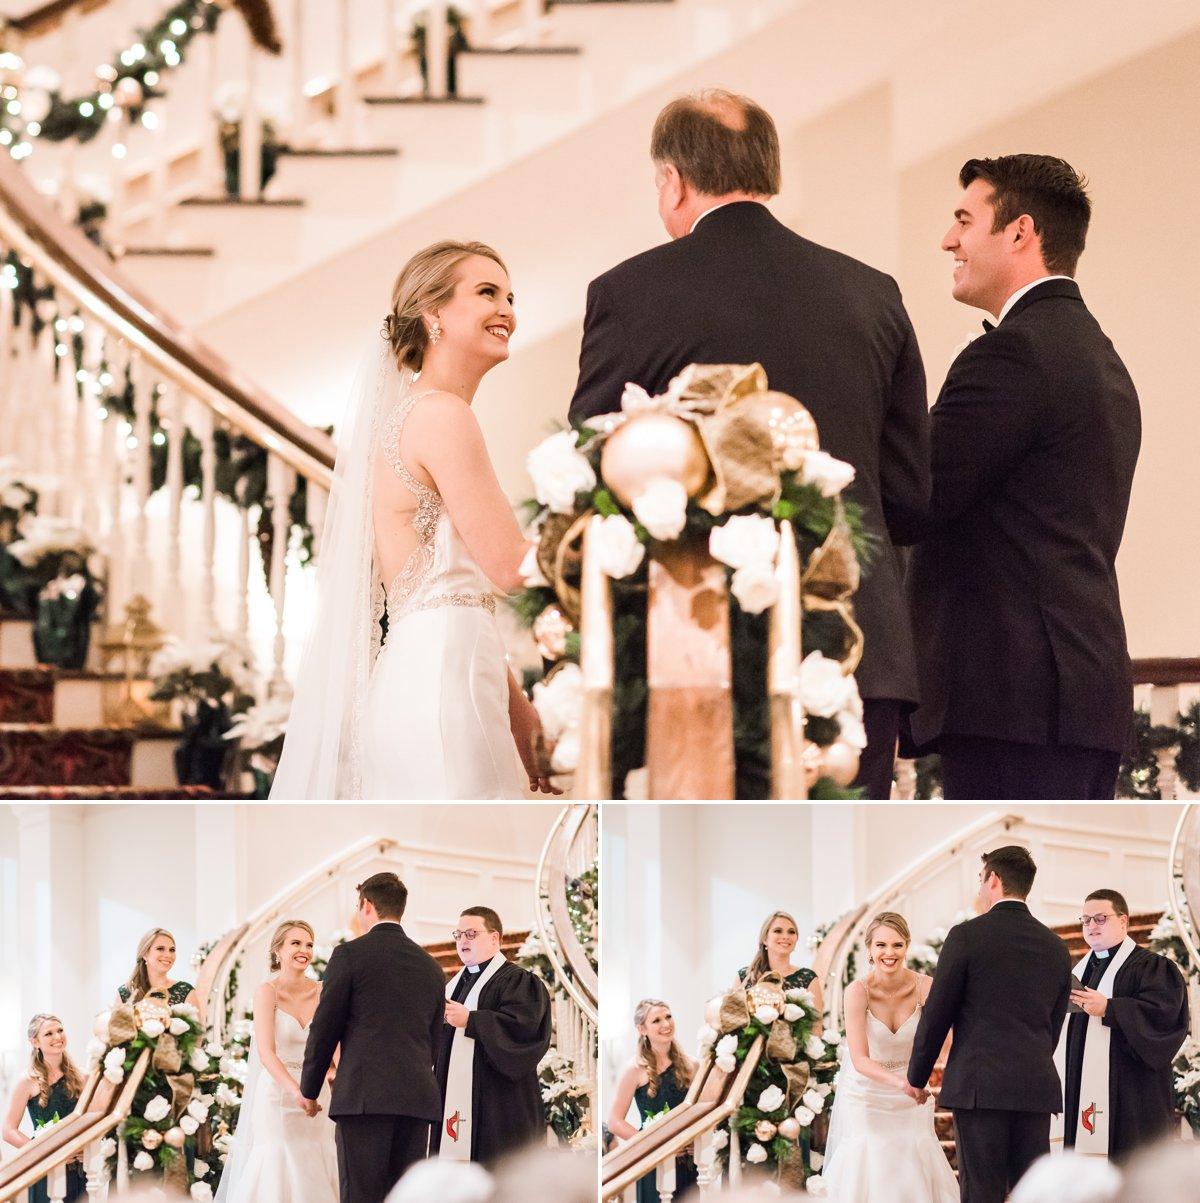 Wedding Photos of Lauren & Bryan by Nate Messarra